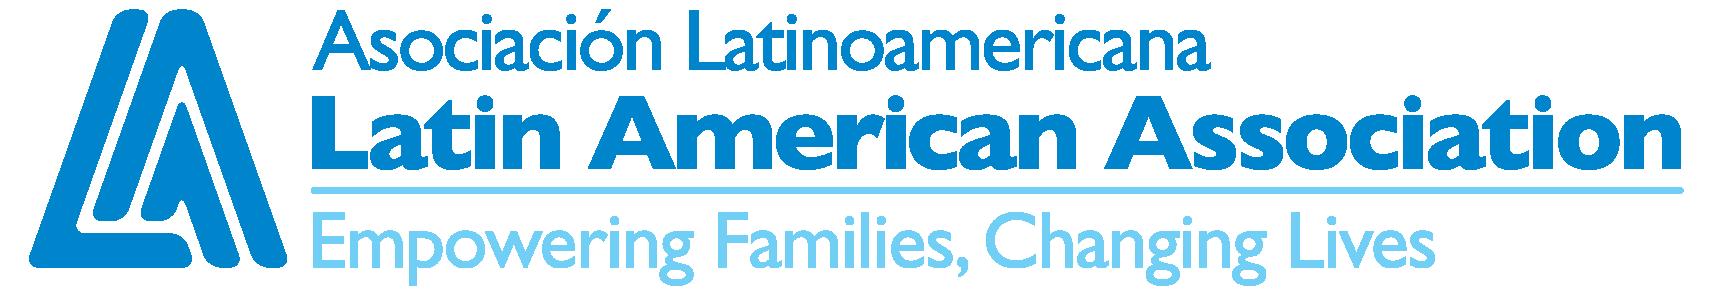 Latin American Asociation 23